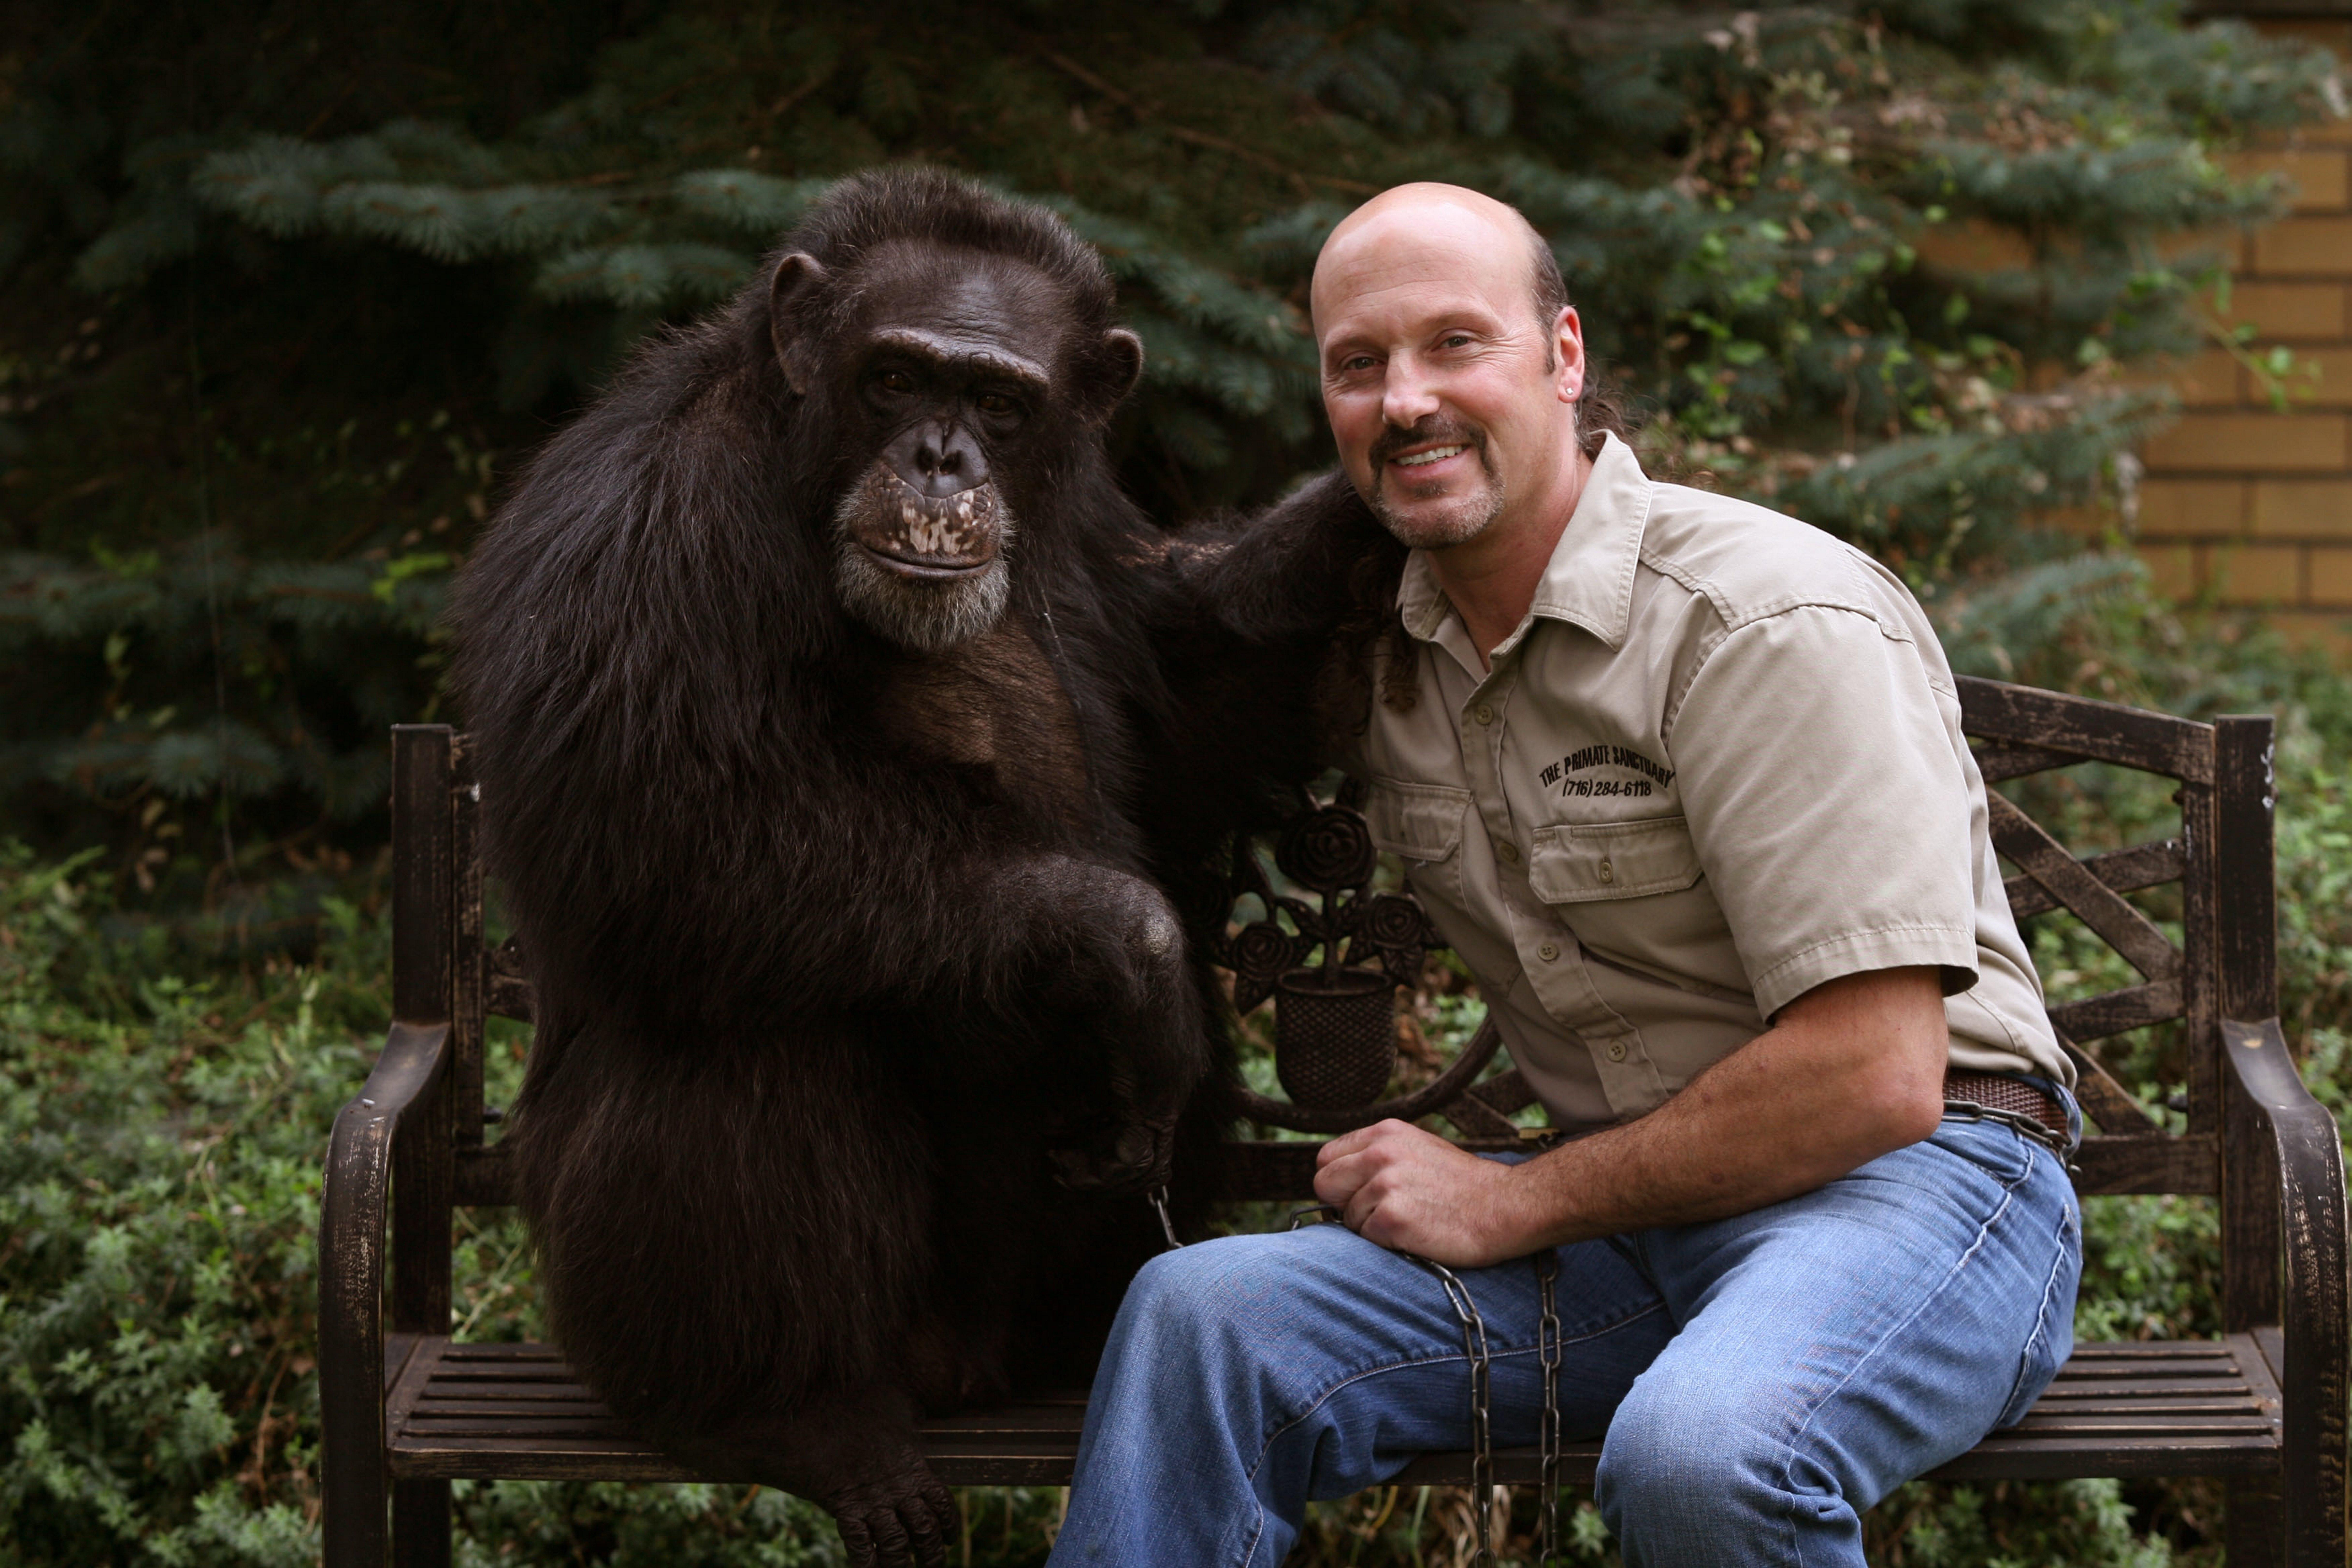 Carmen Presti, vice president of the Primate Sanctuary in Niagara Falls, is seen with Kiko, a 200-pound chimpanzee. PHOTO BY CHARLES LEWIS